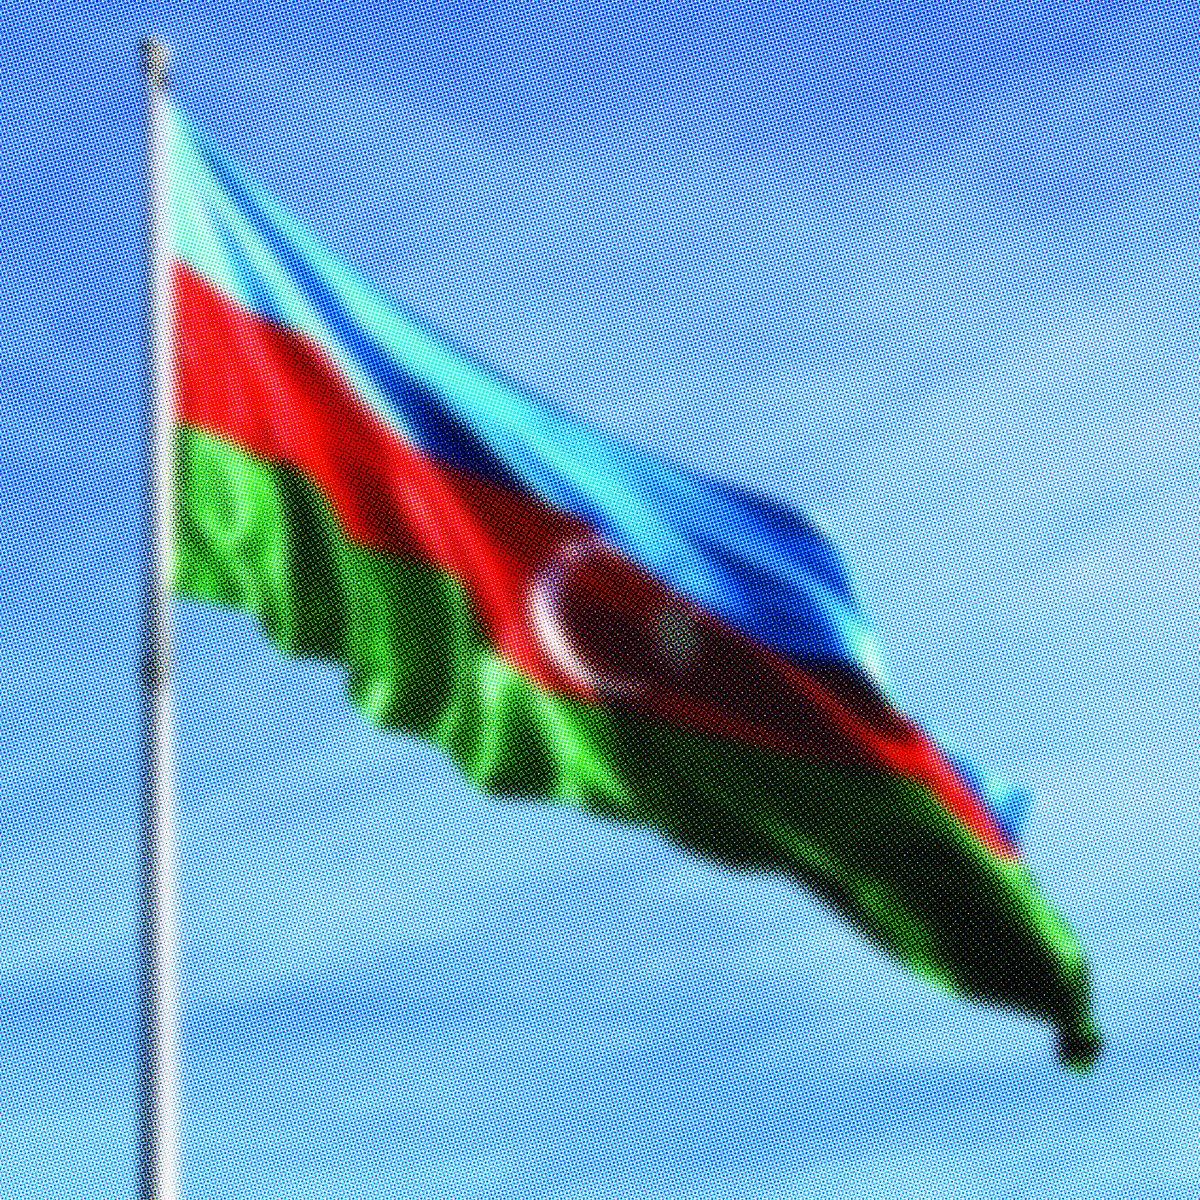 Azerbaidjan-drapeau-640x640